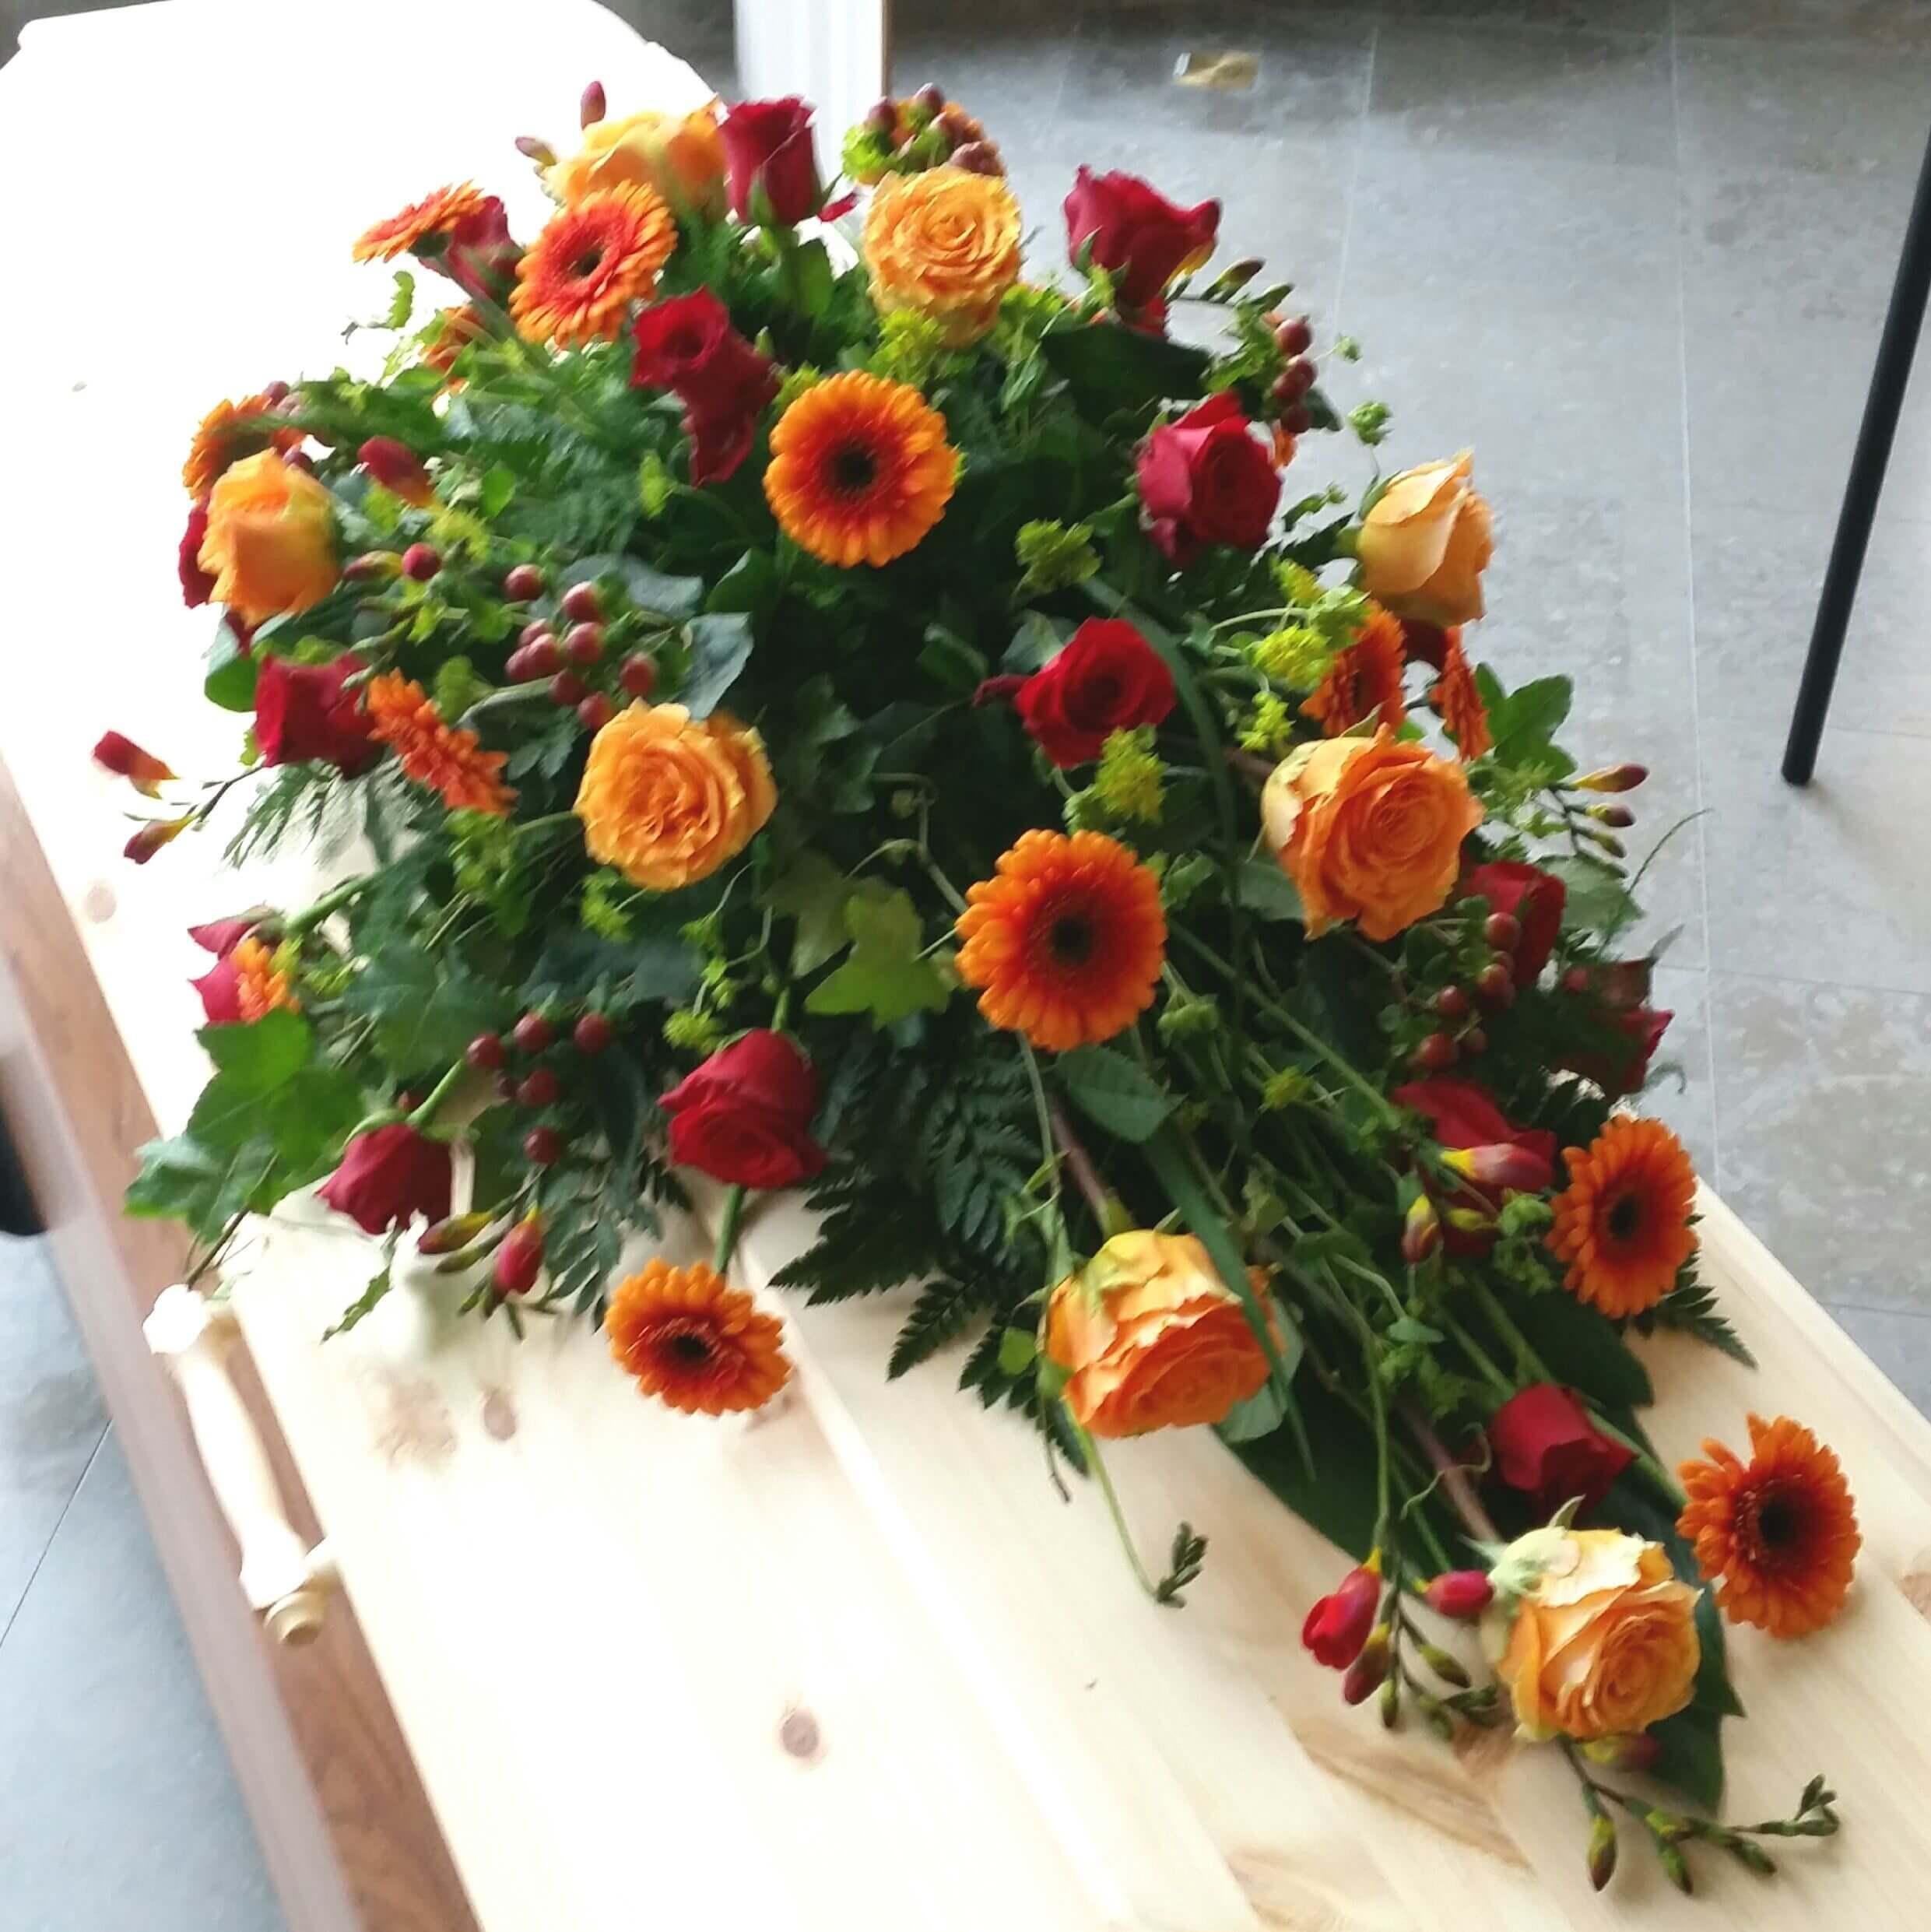 höstprakt Kistdekoration begravningsblommor